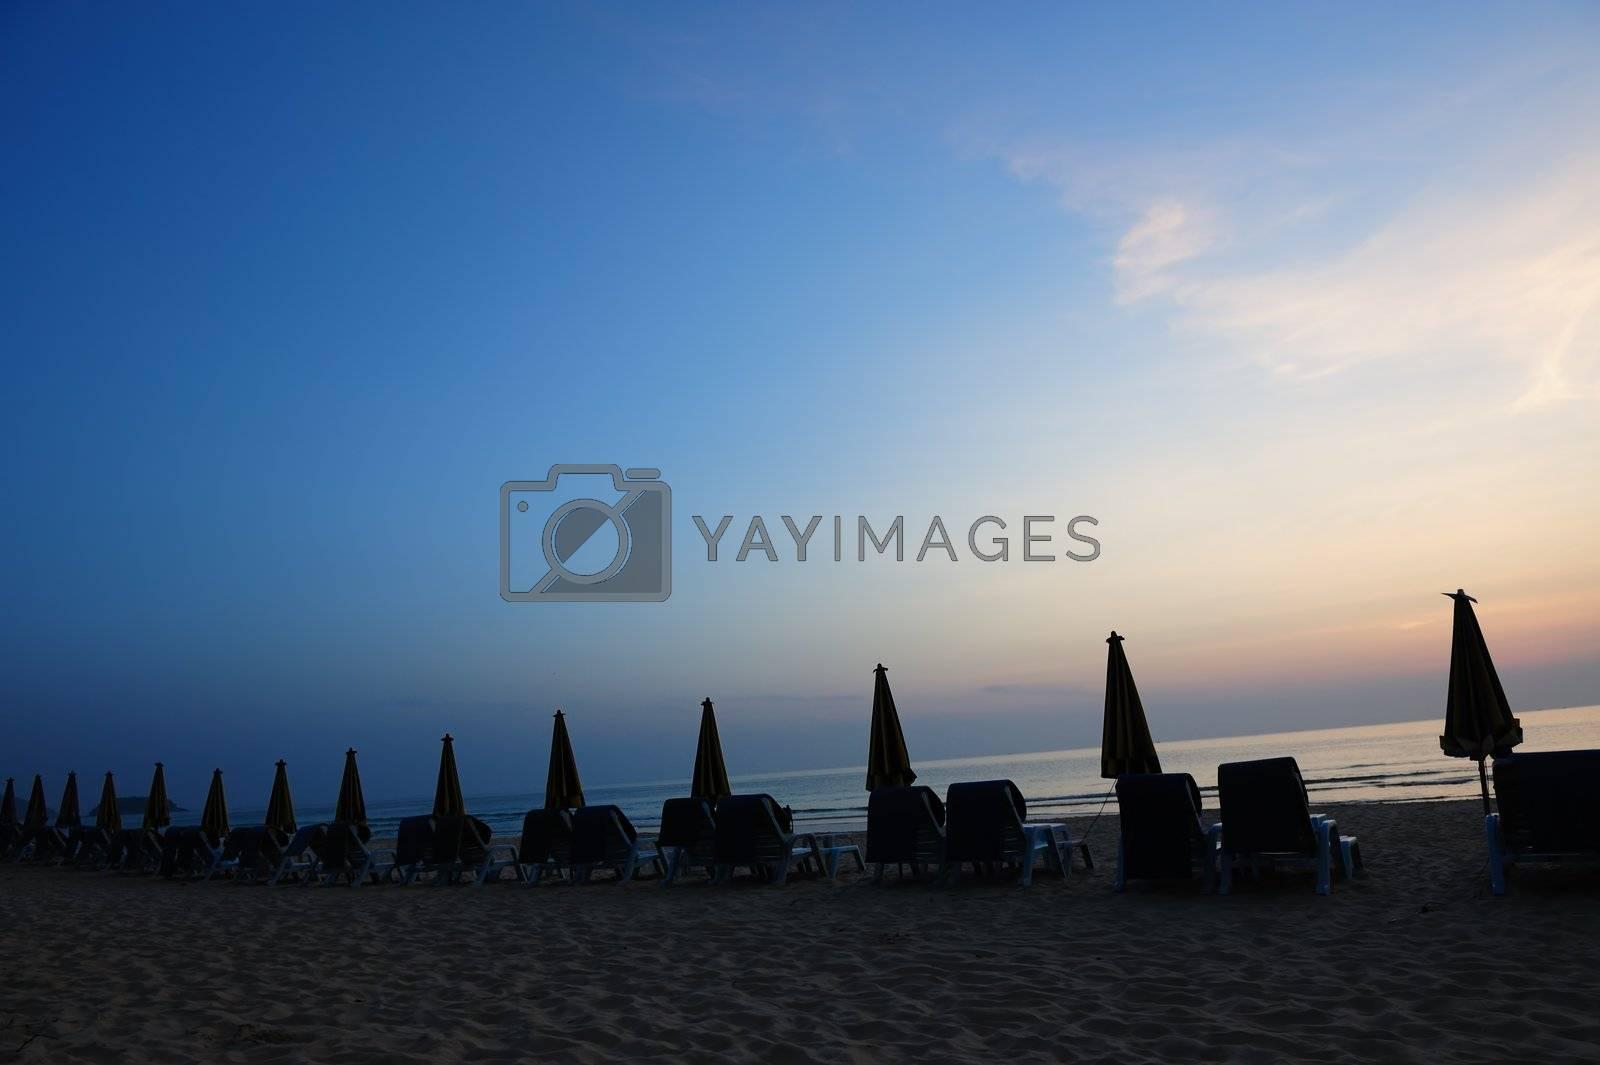 Beach landscape with a row of folded umbrella in Phuket Island, Thailand